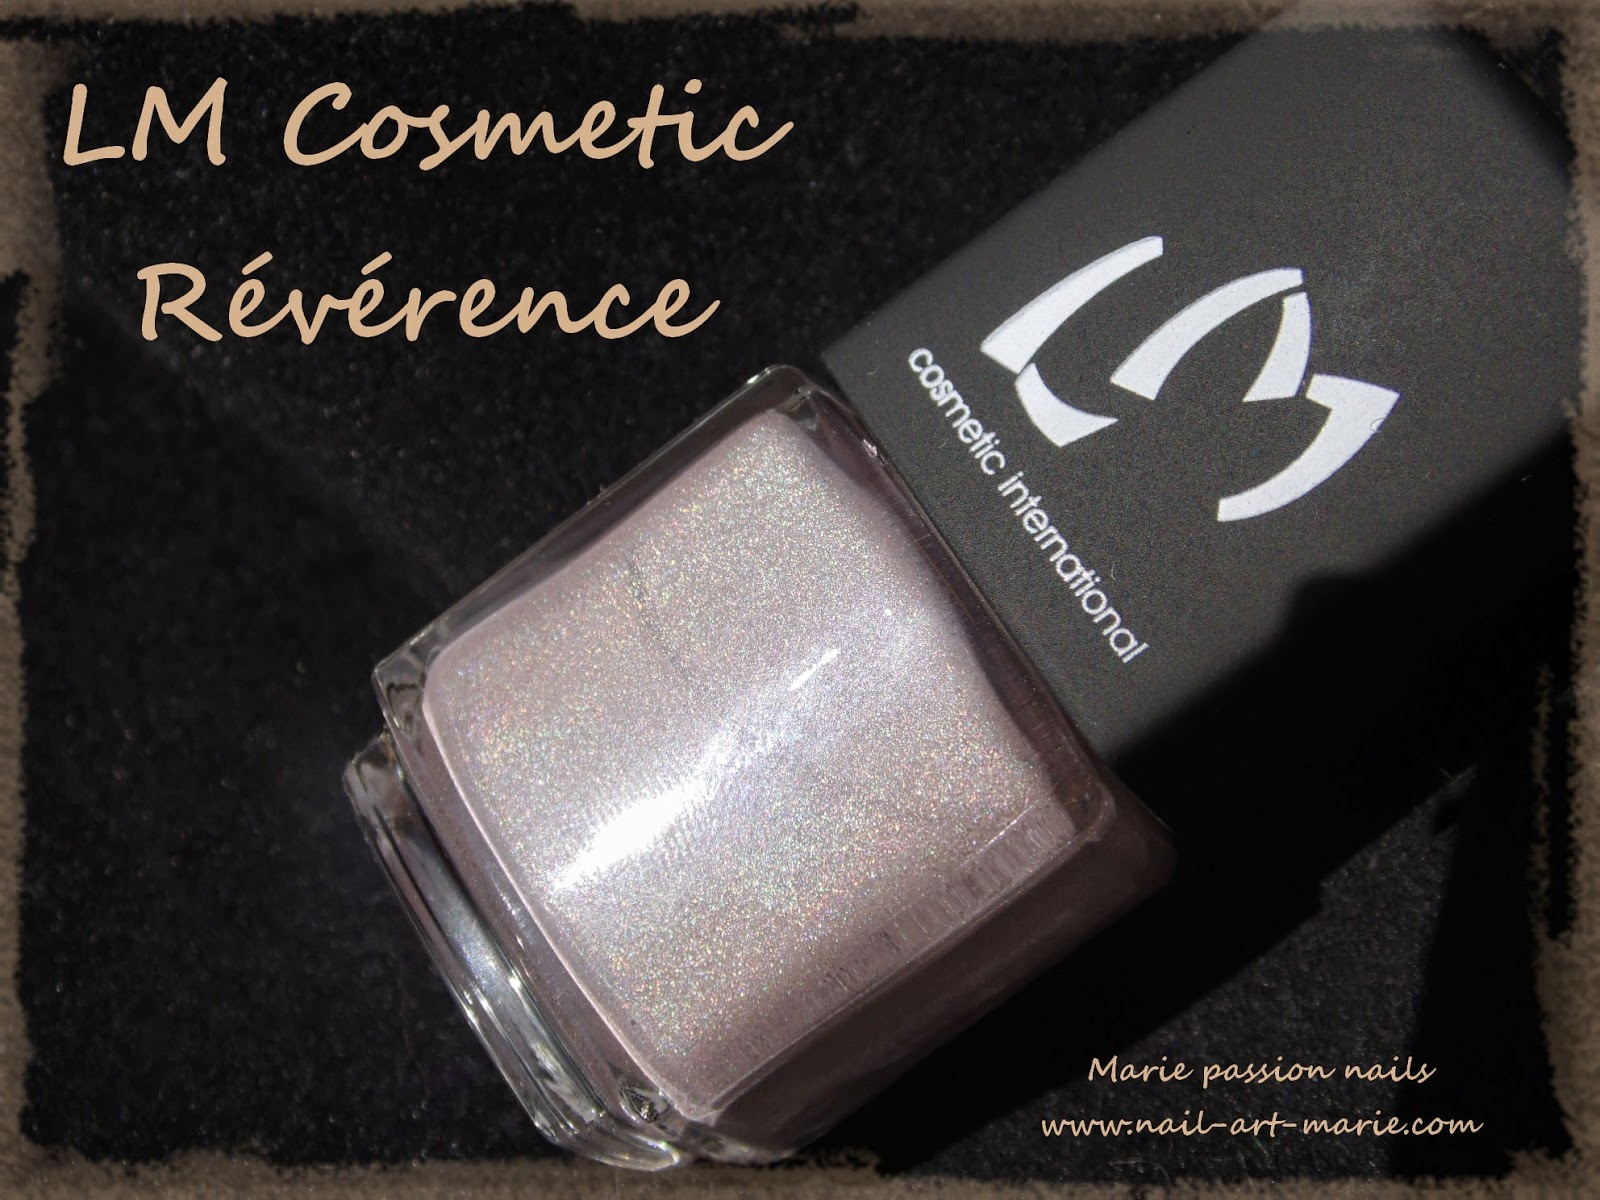 LM Cosmetic Révérence1